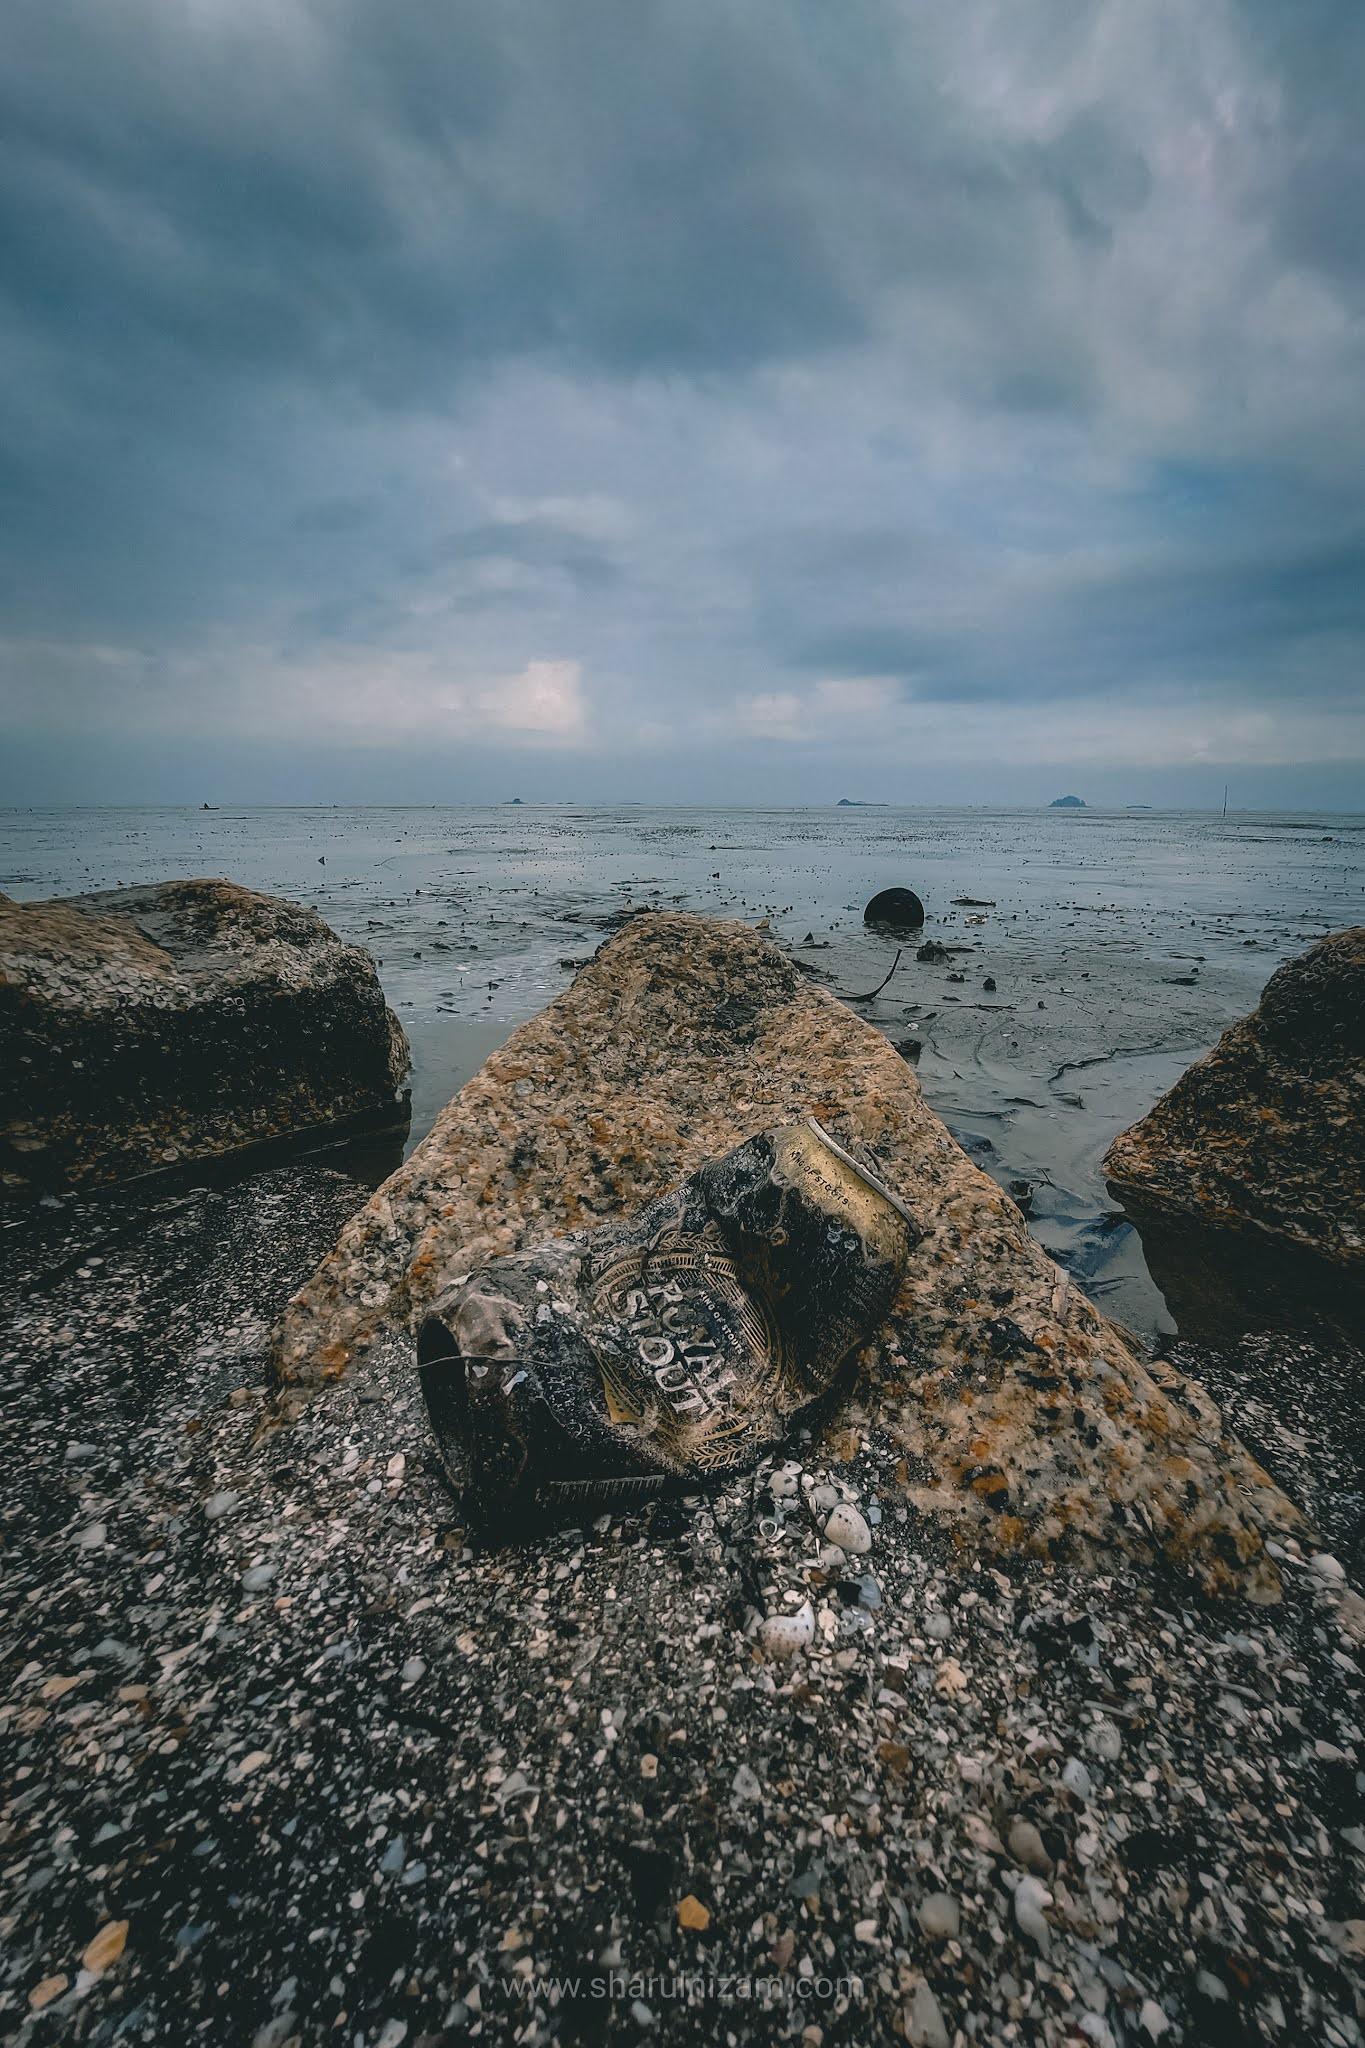 Pagi Yang Suram Di Pantai Jeram, Selangor